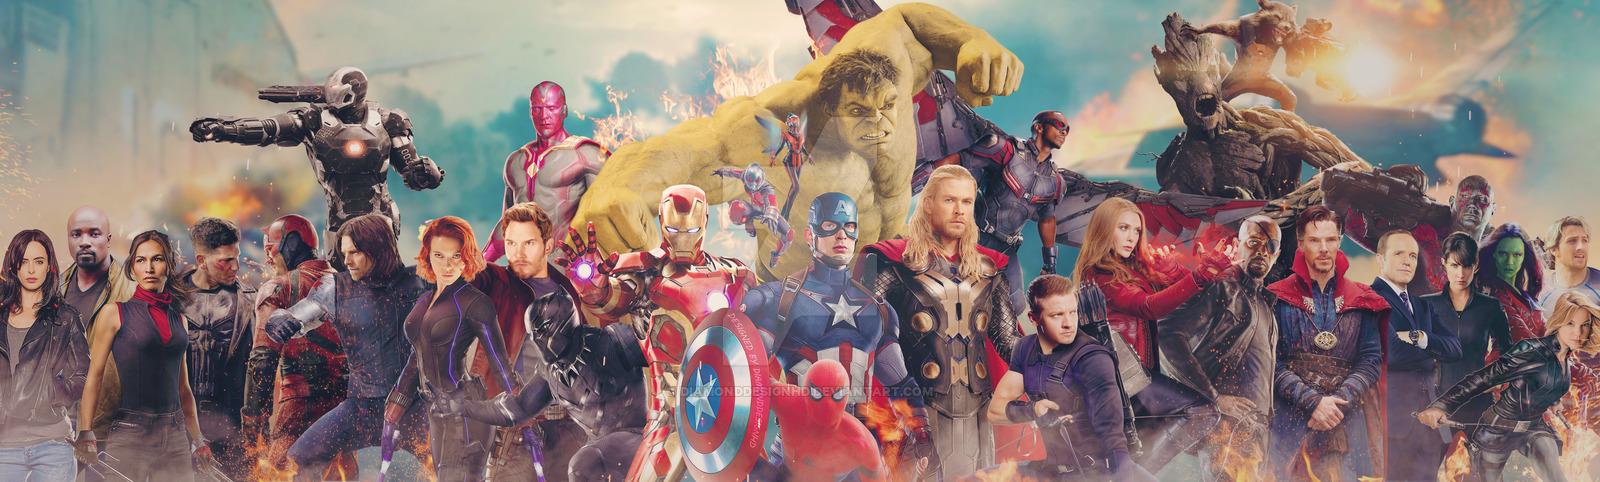 Marvel Cinematic Universe by DiamondDesignHD 1600x482